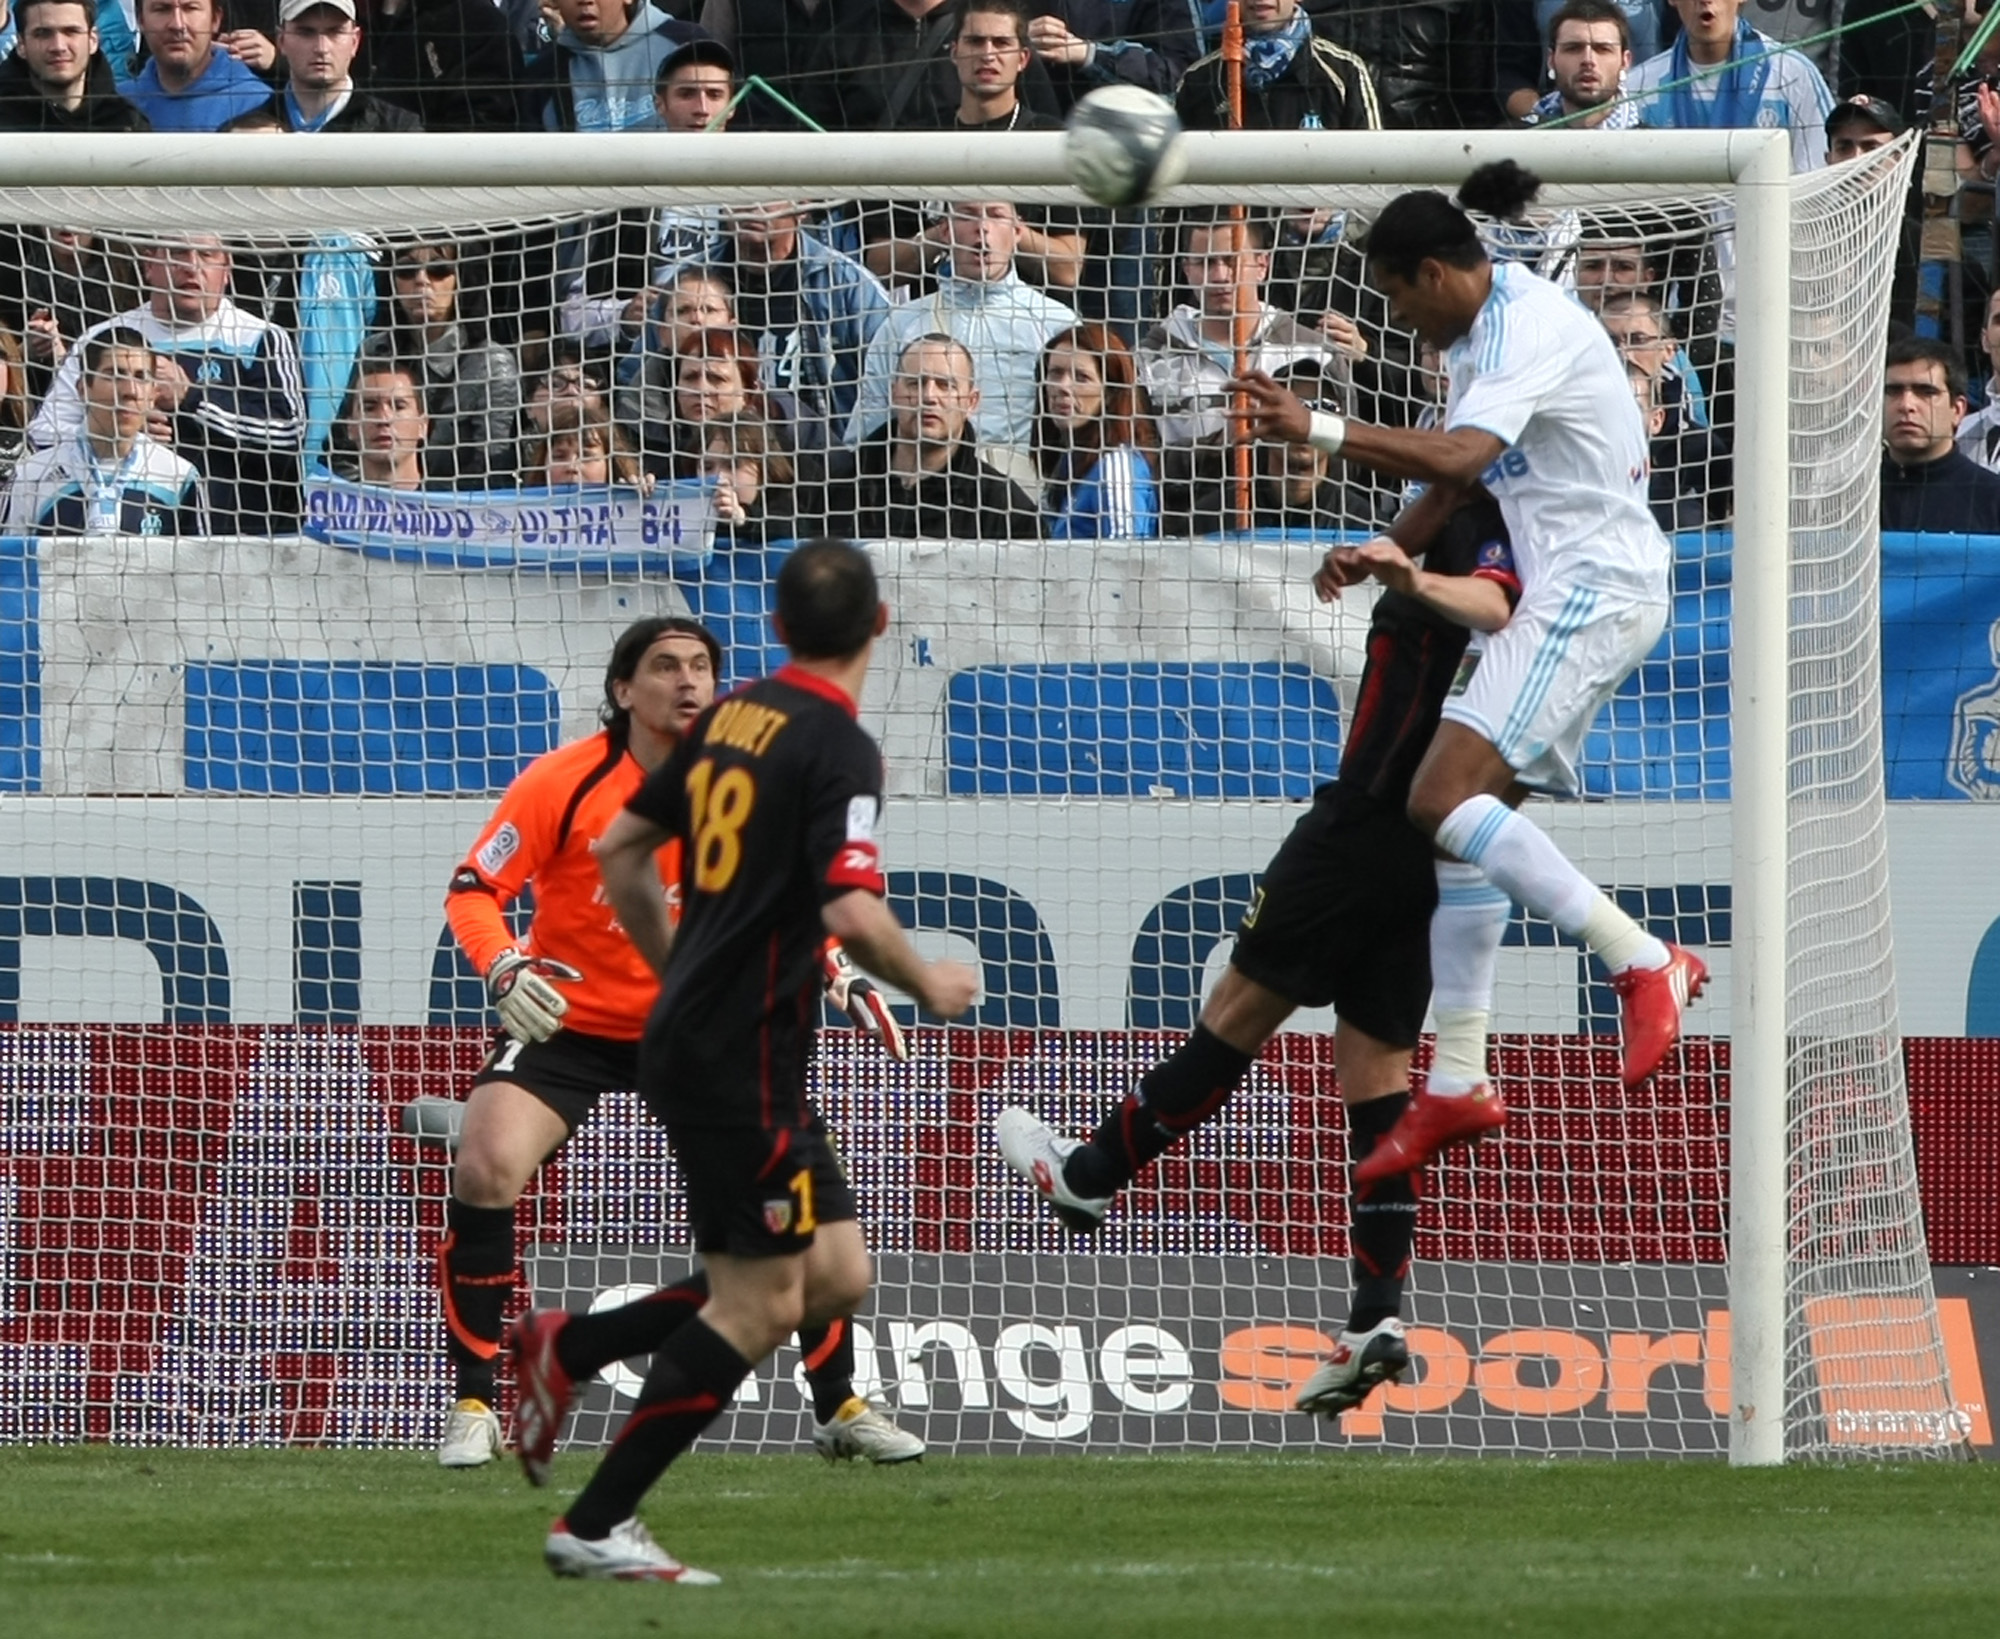 Marseille's Brazilian forward Evaeverson Lemos Brandao, right, heads the ball and scores a goal past Lens'goalkepper Vedran Runje, during their French...